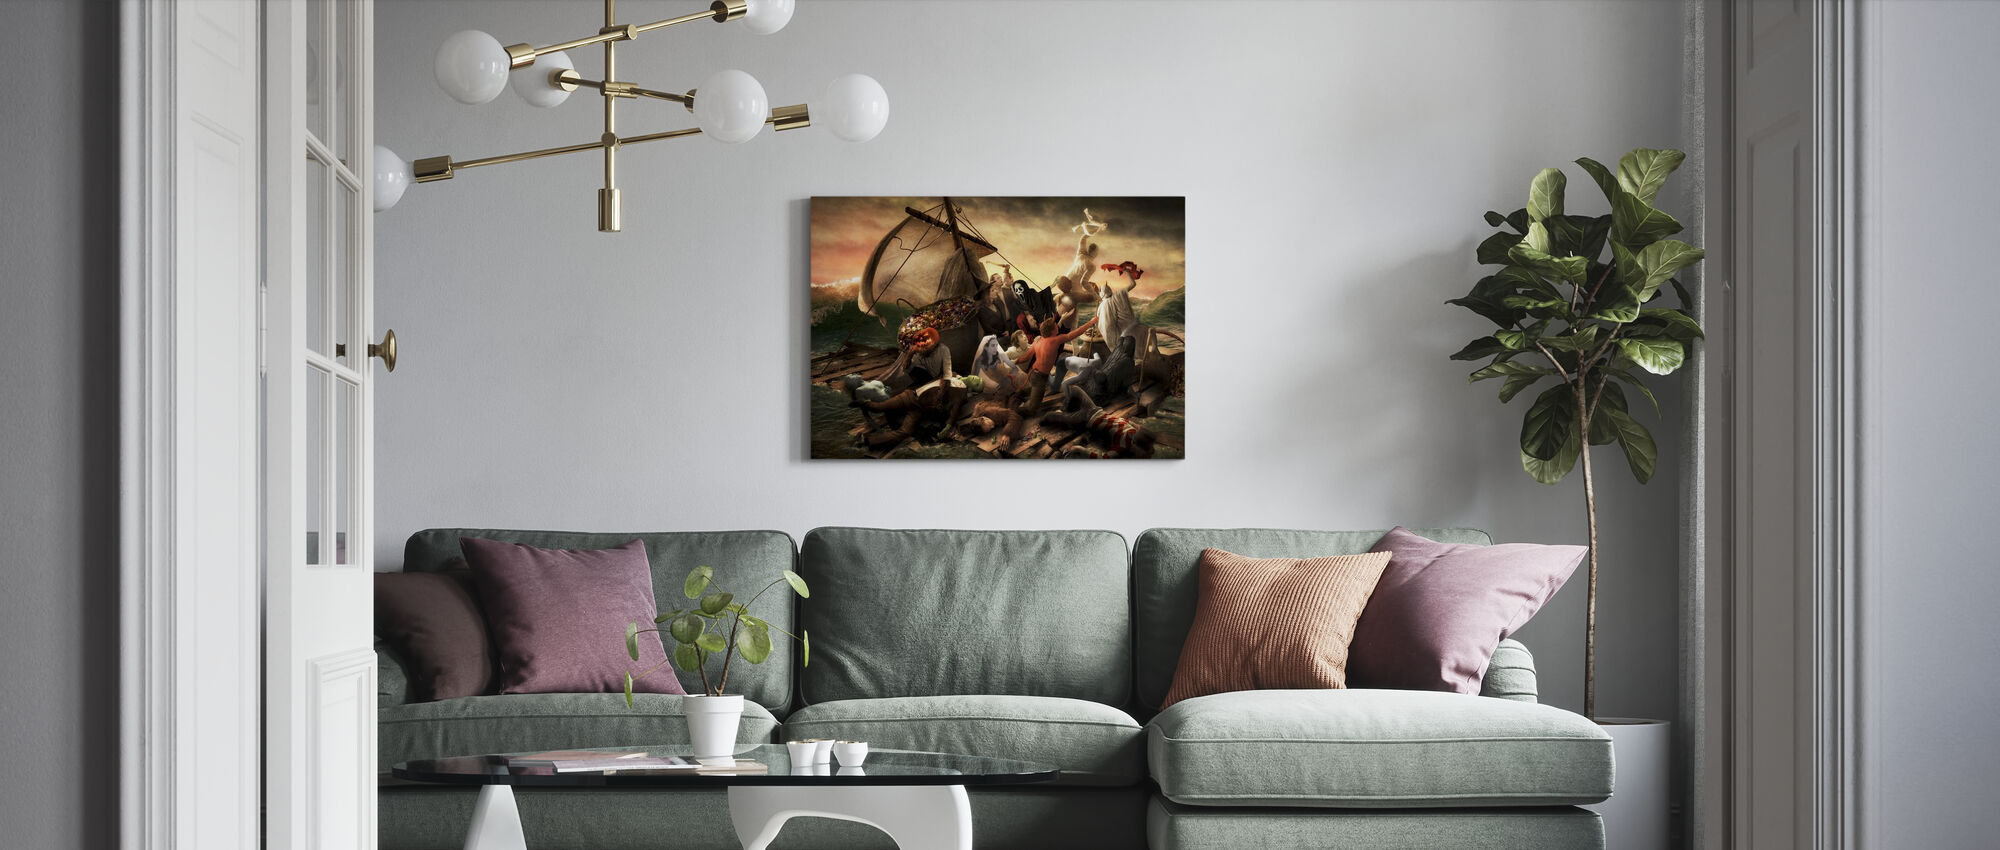 Flottan av Halloween - Canvastavla - Vardagsrum